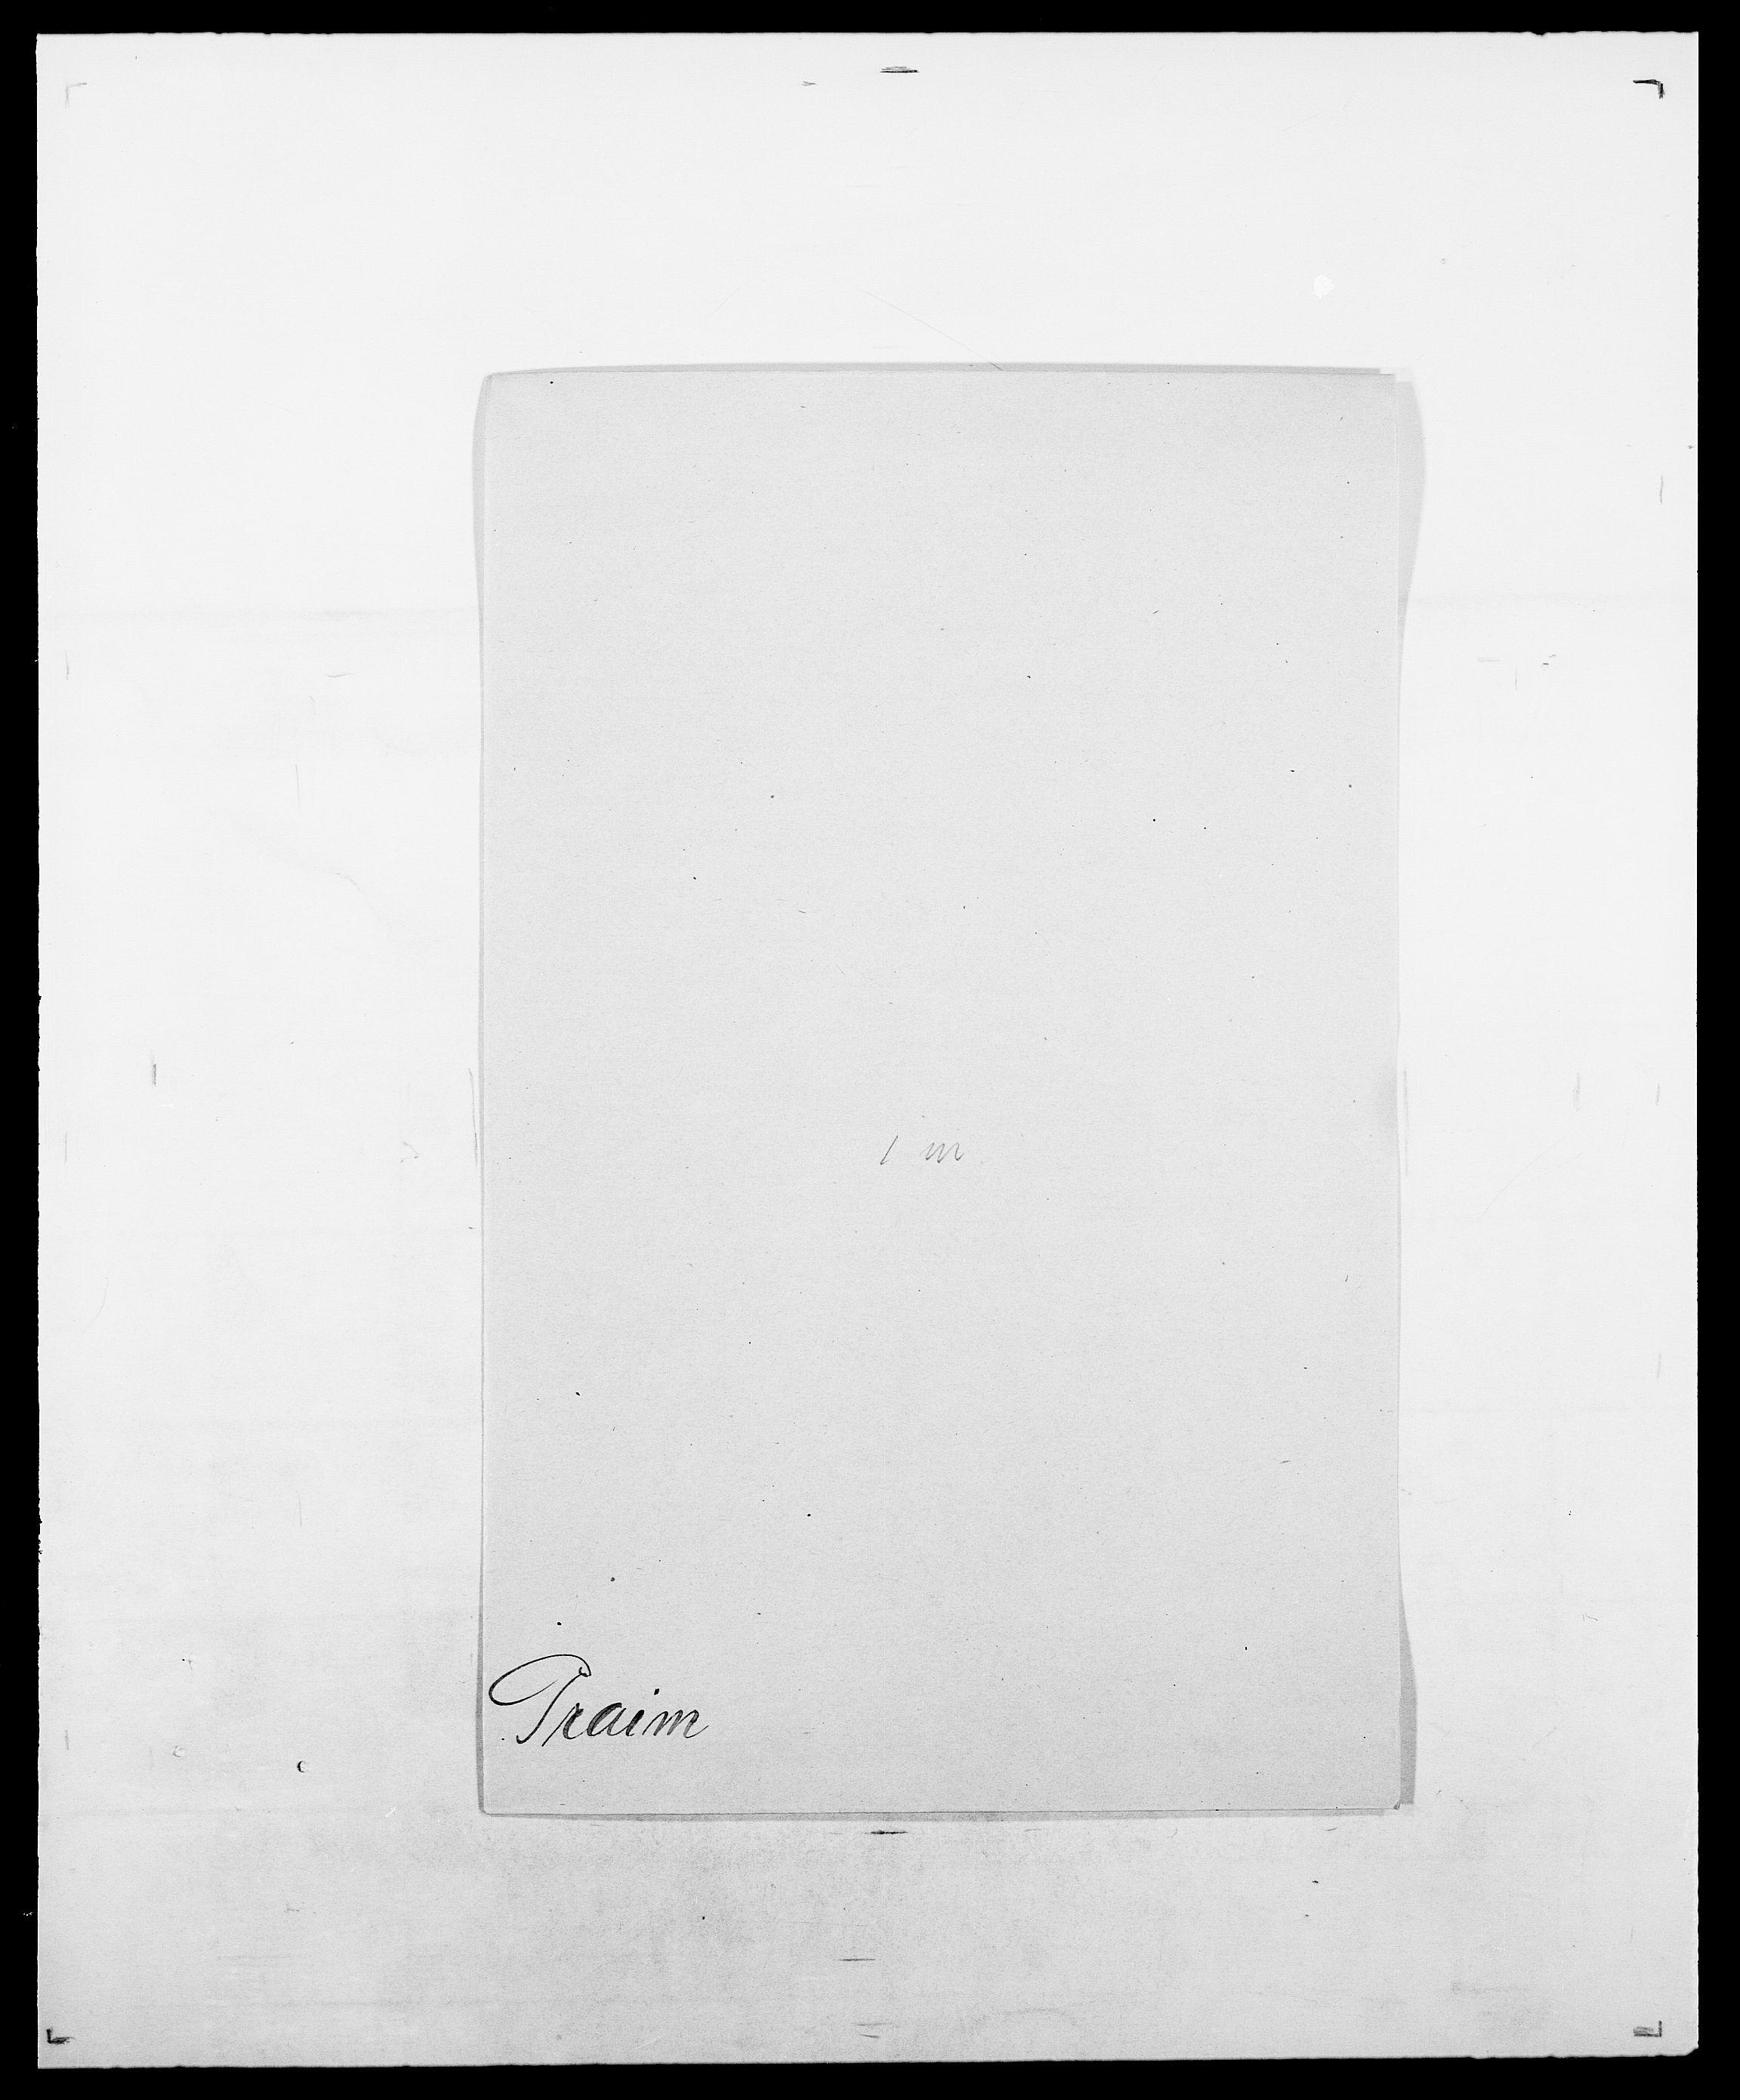 SAO, Delgobe, Charles Antoine - samling, D/Da/L0031: de Place - Raaum, s. 287